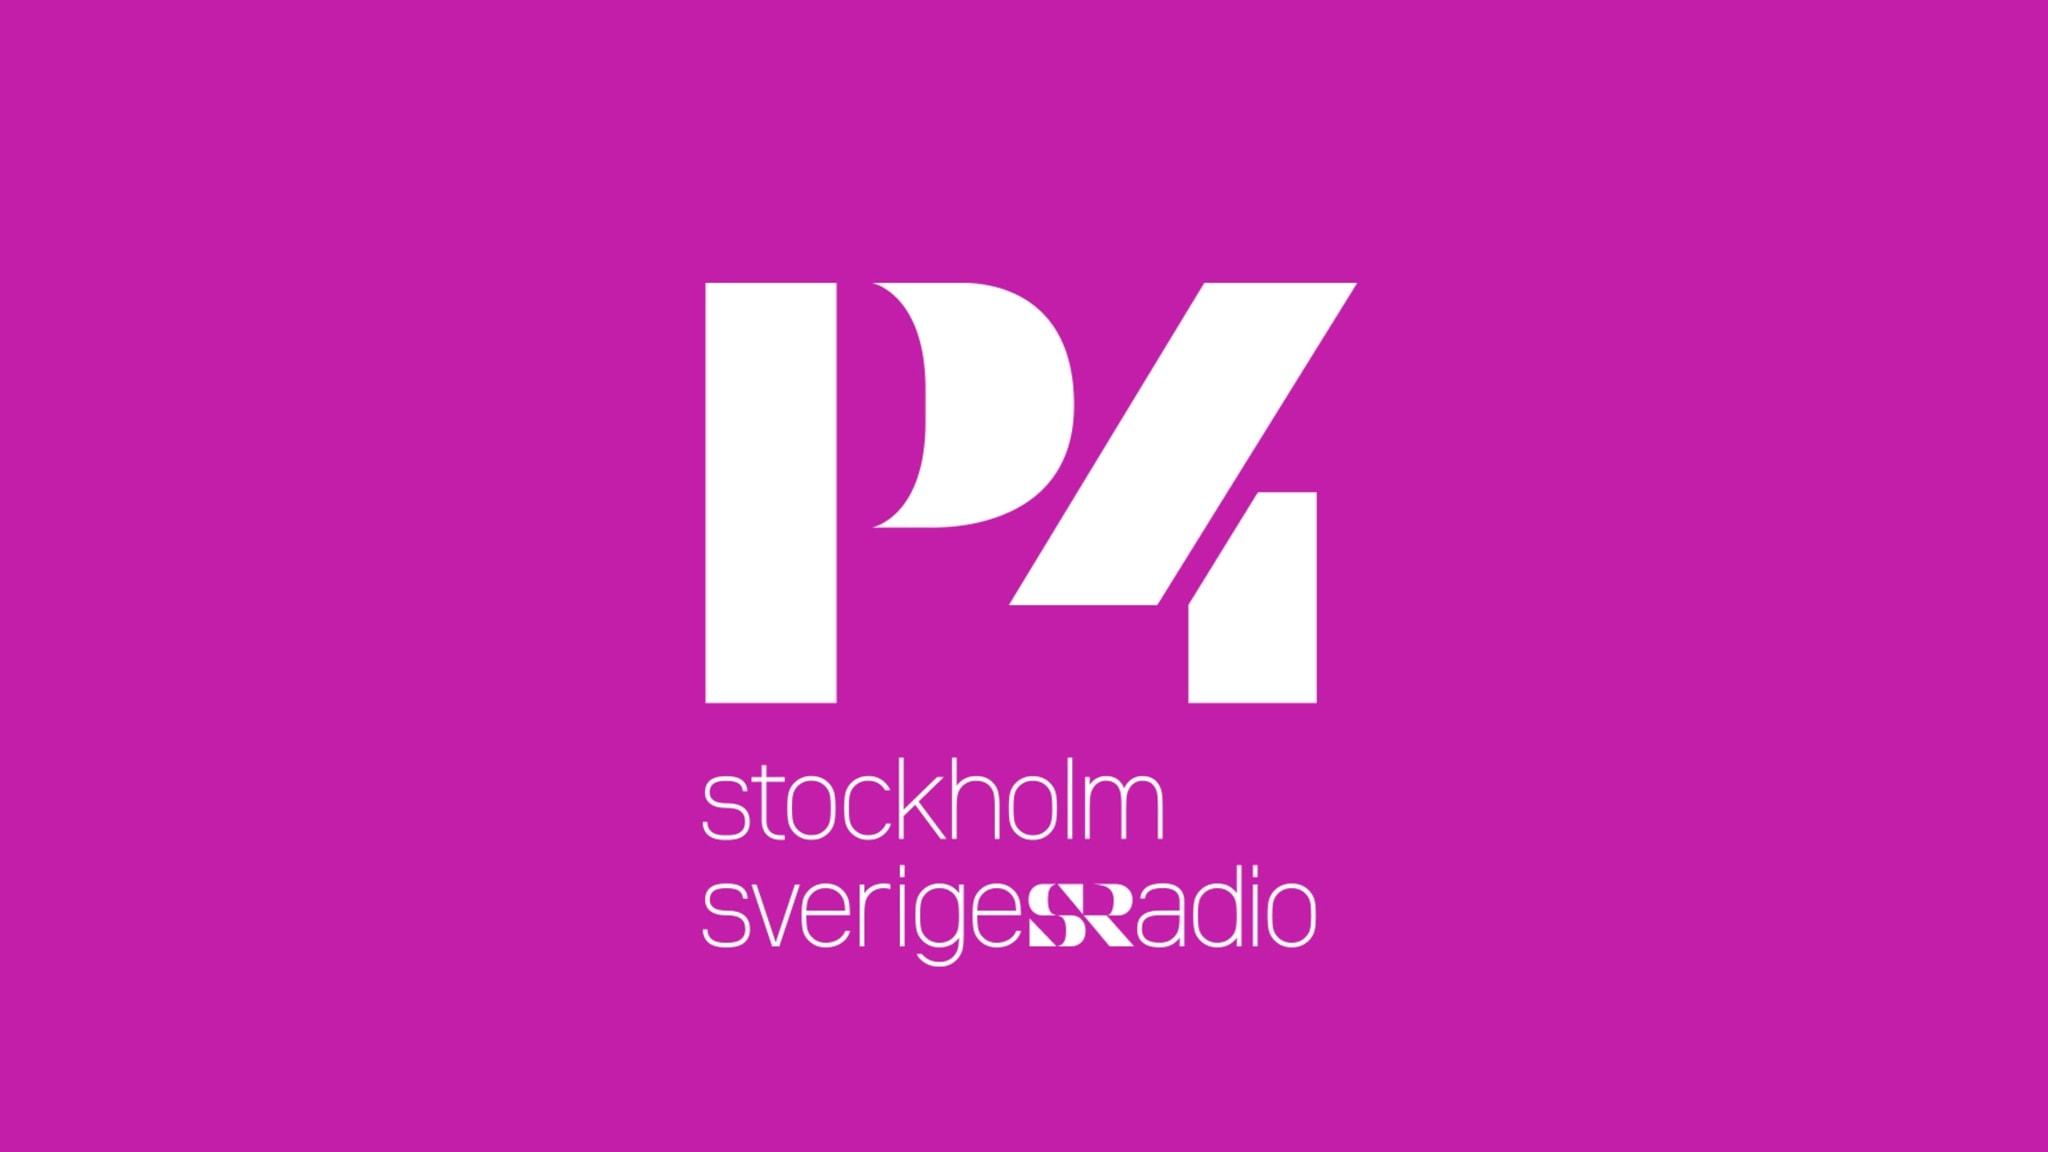 Nyheter P4 Stockholm